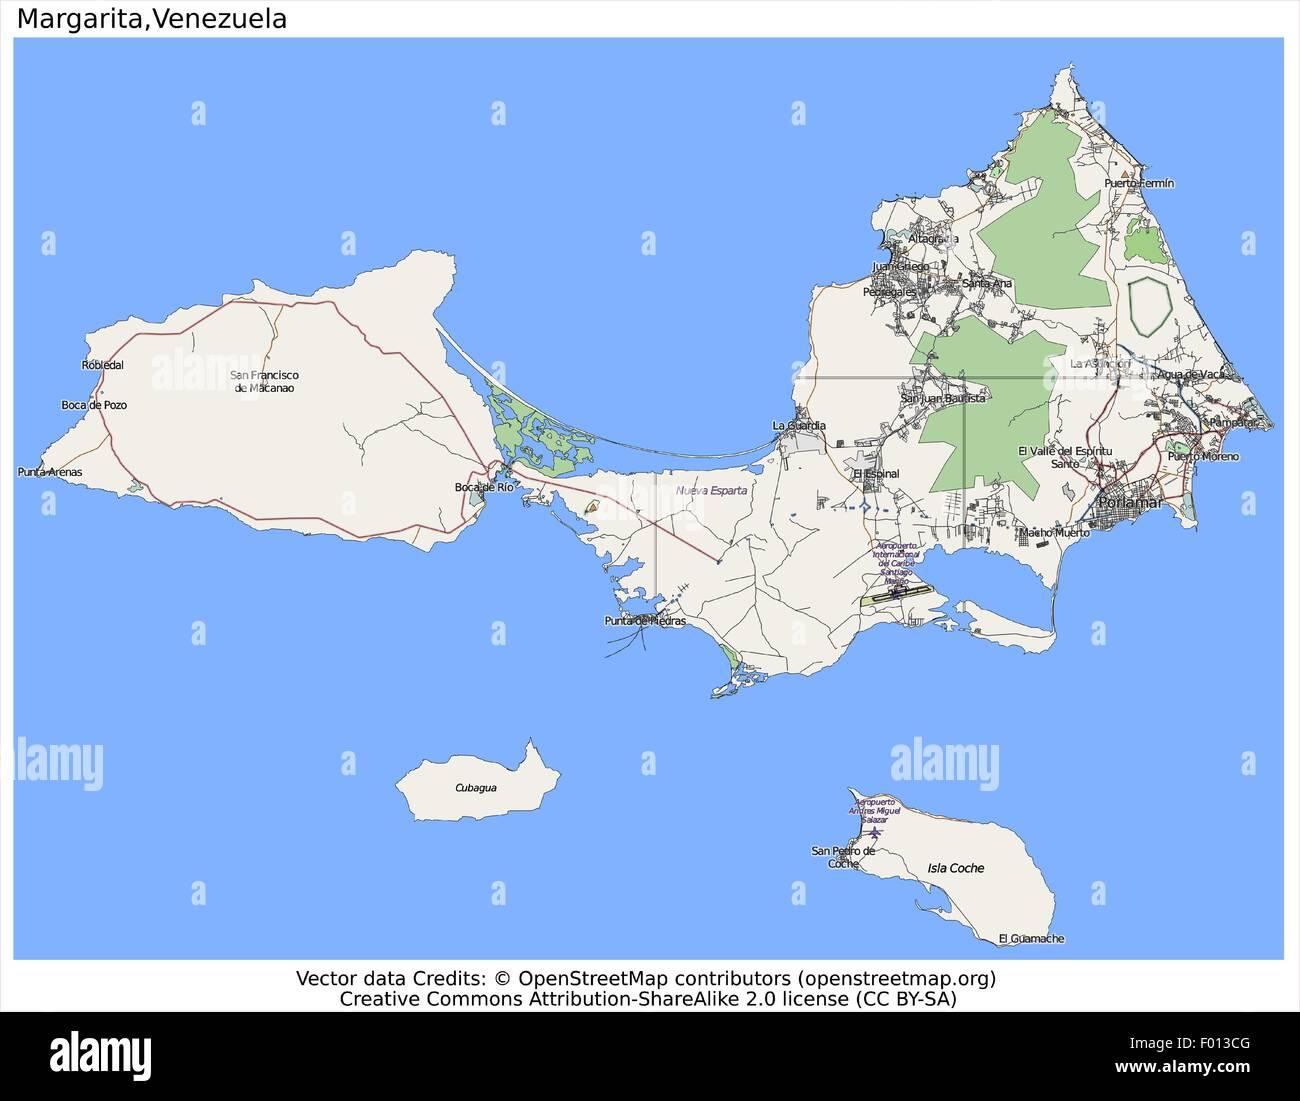 Map Of Margarita Island Margarita Island Venezuela area city map aerial view Stock Vector